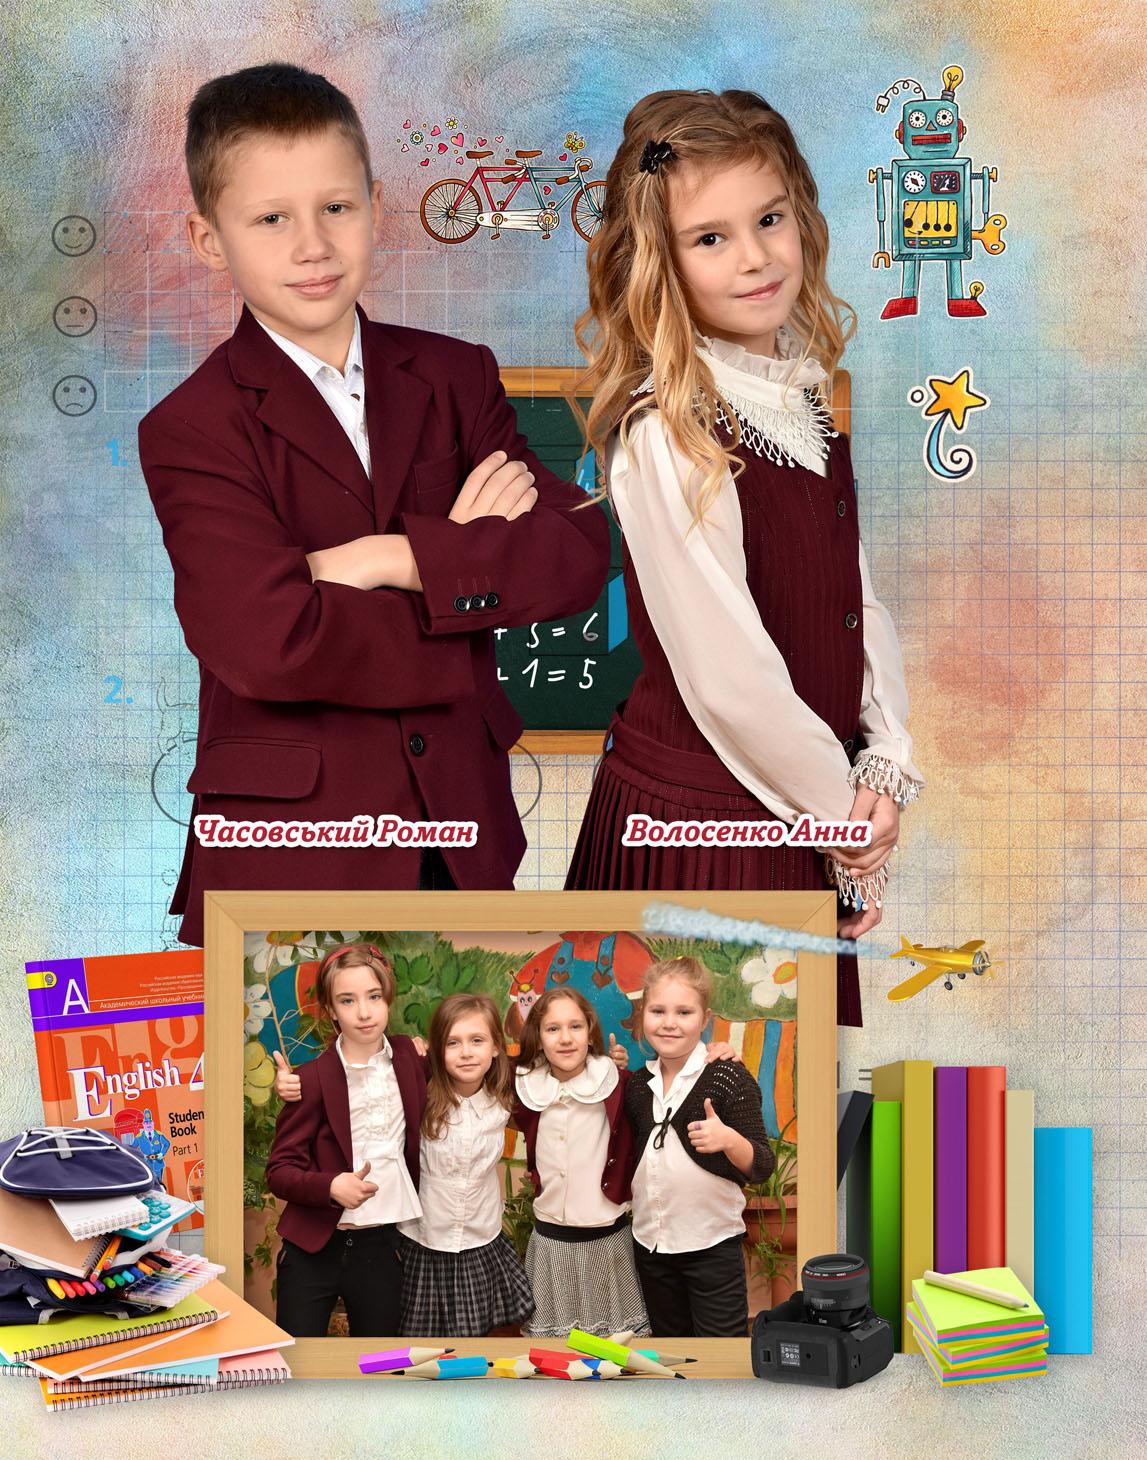 https://school-photo.com.ua/wp-content/uploads/2017/09/12-copy-2.jpg